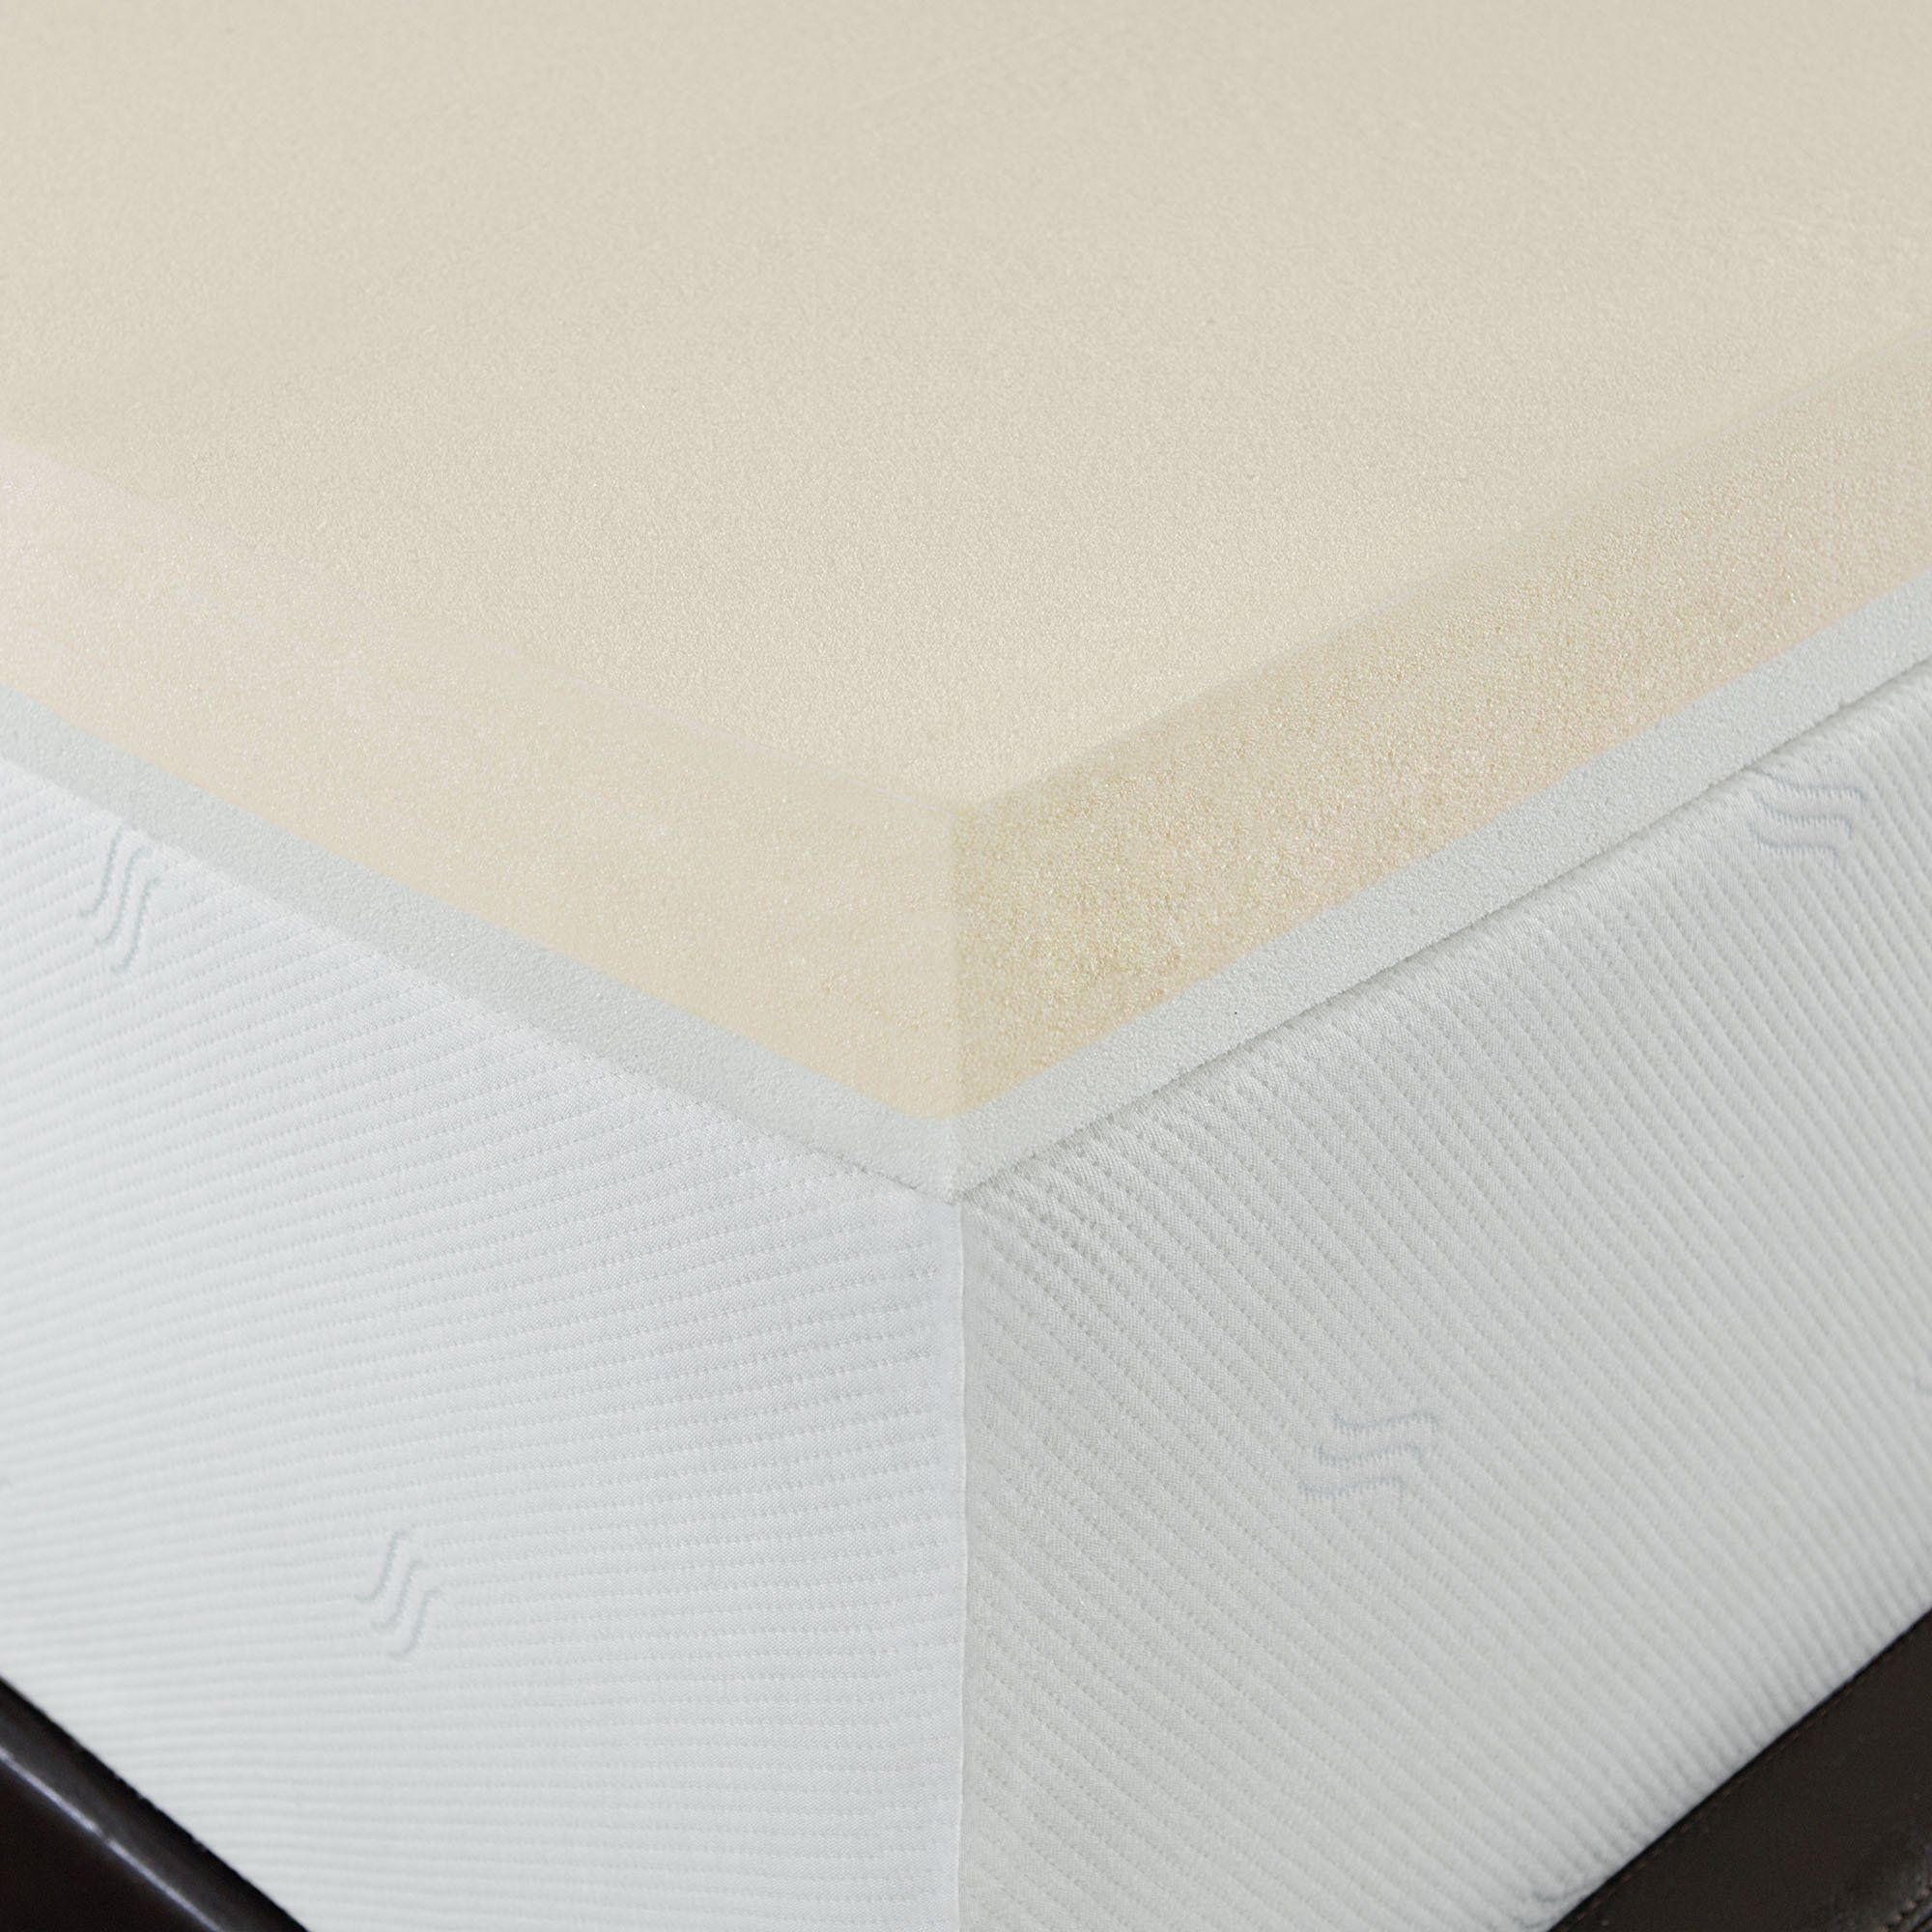 Serta Triple Layer Comfort, 4Inch Memory Foam Mattress